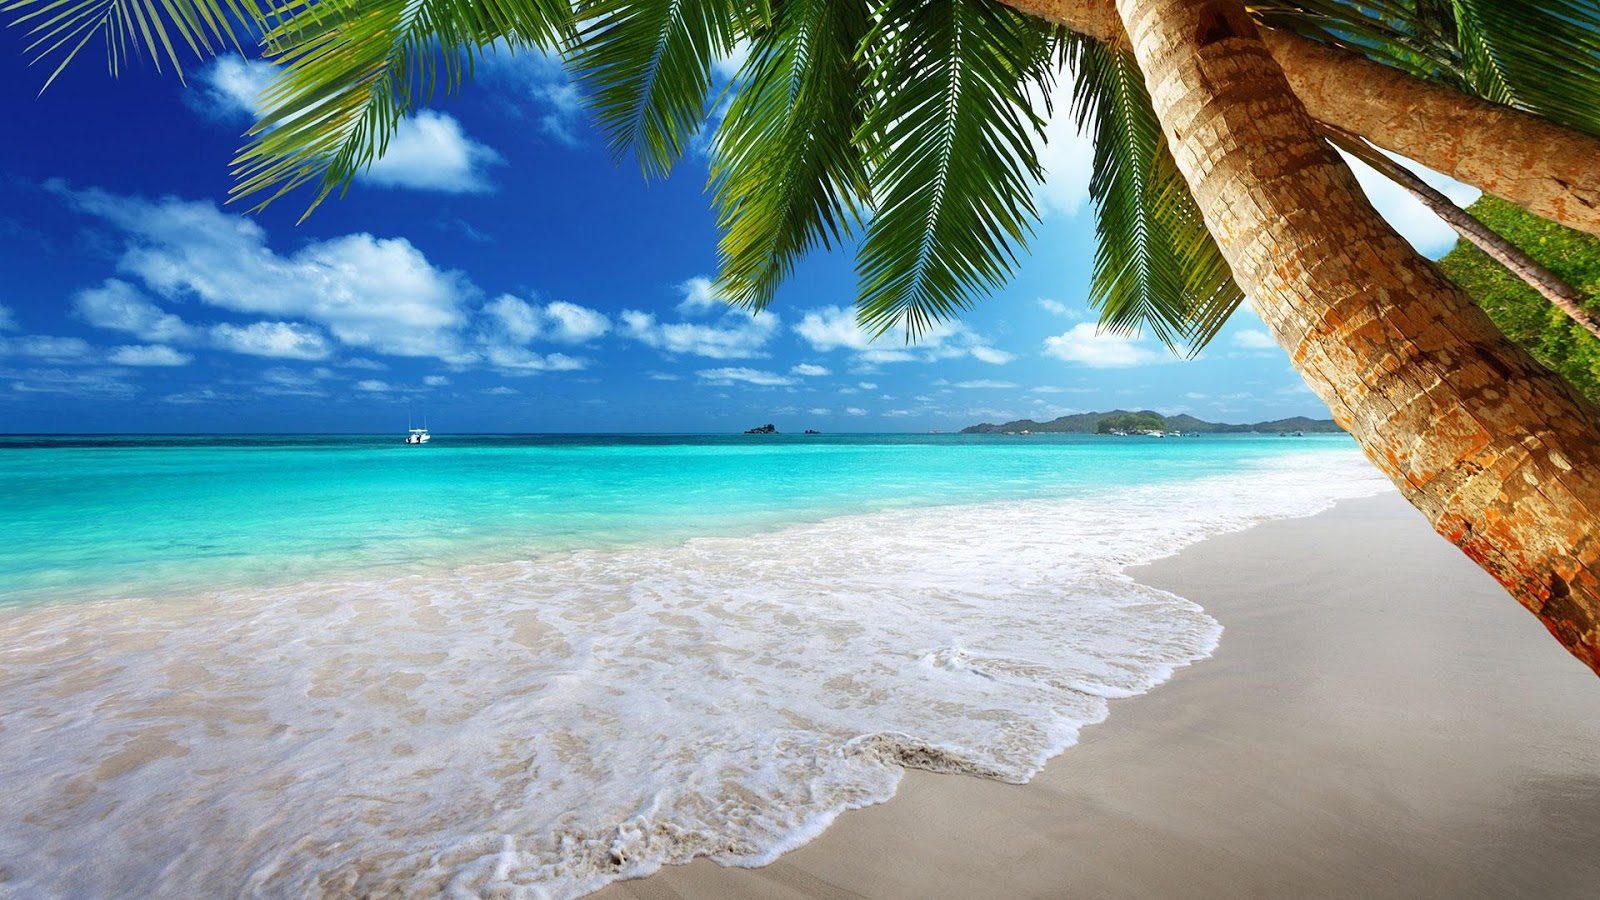 beach screensavers | best wallpapers hd gallery